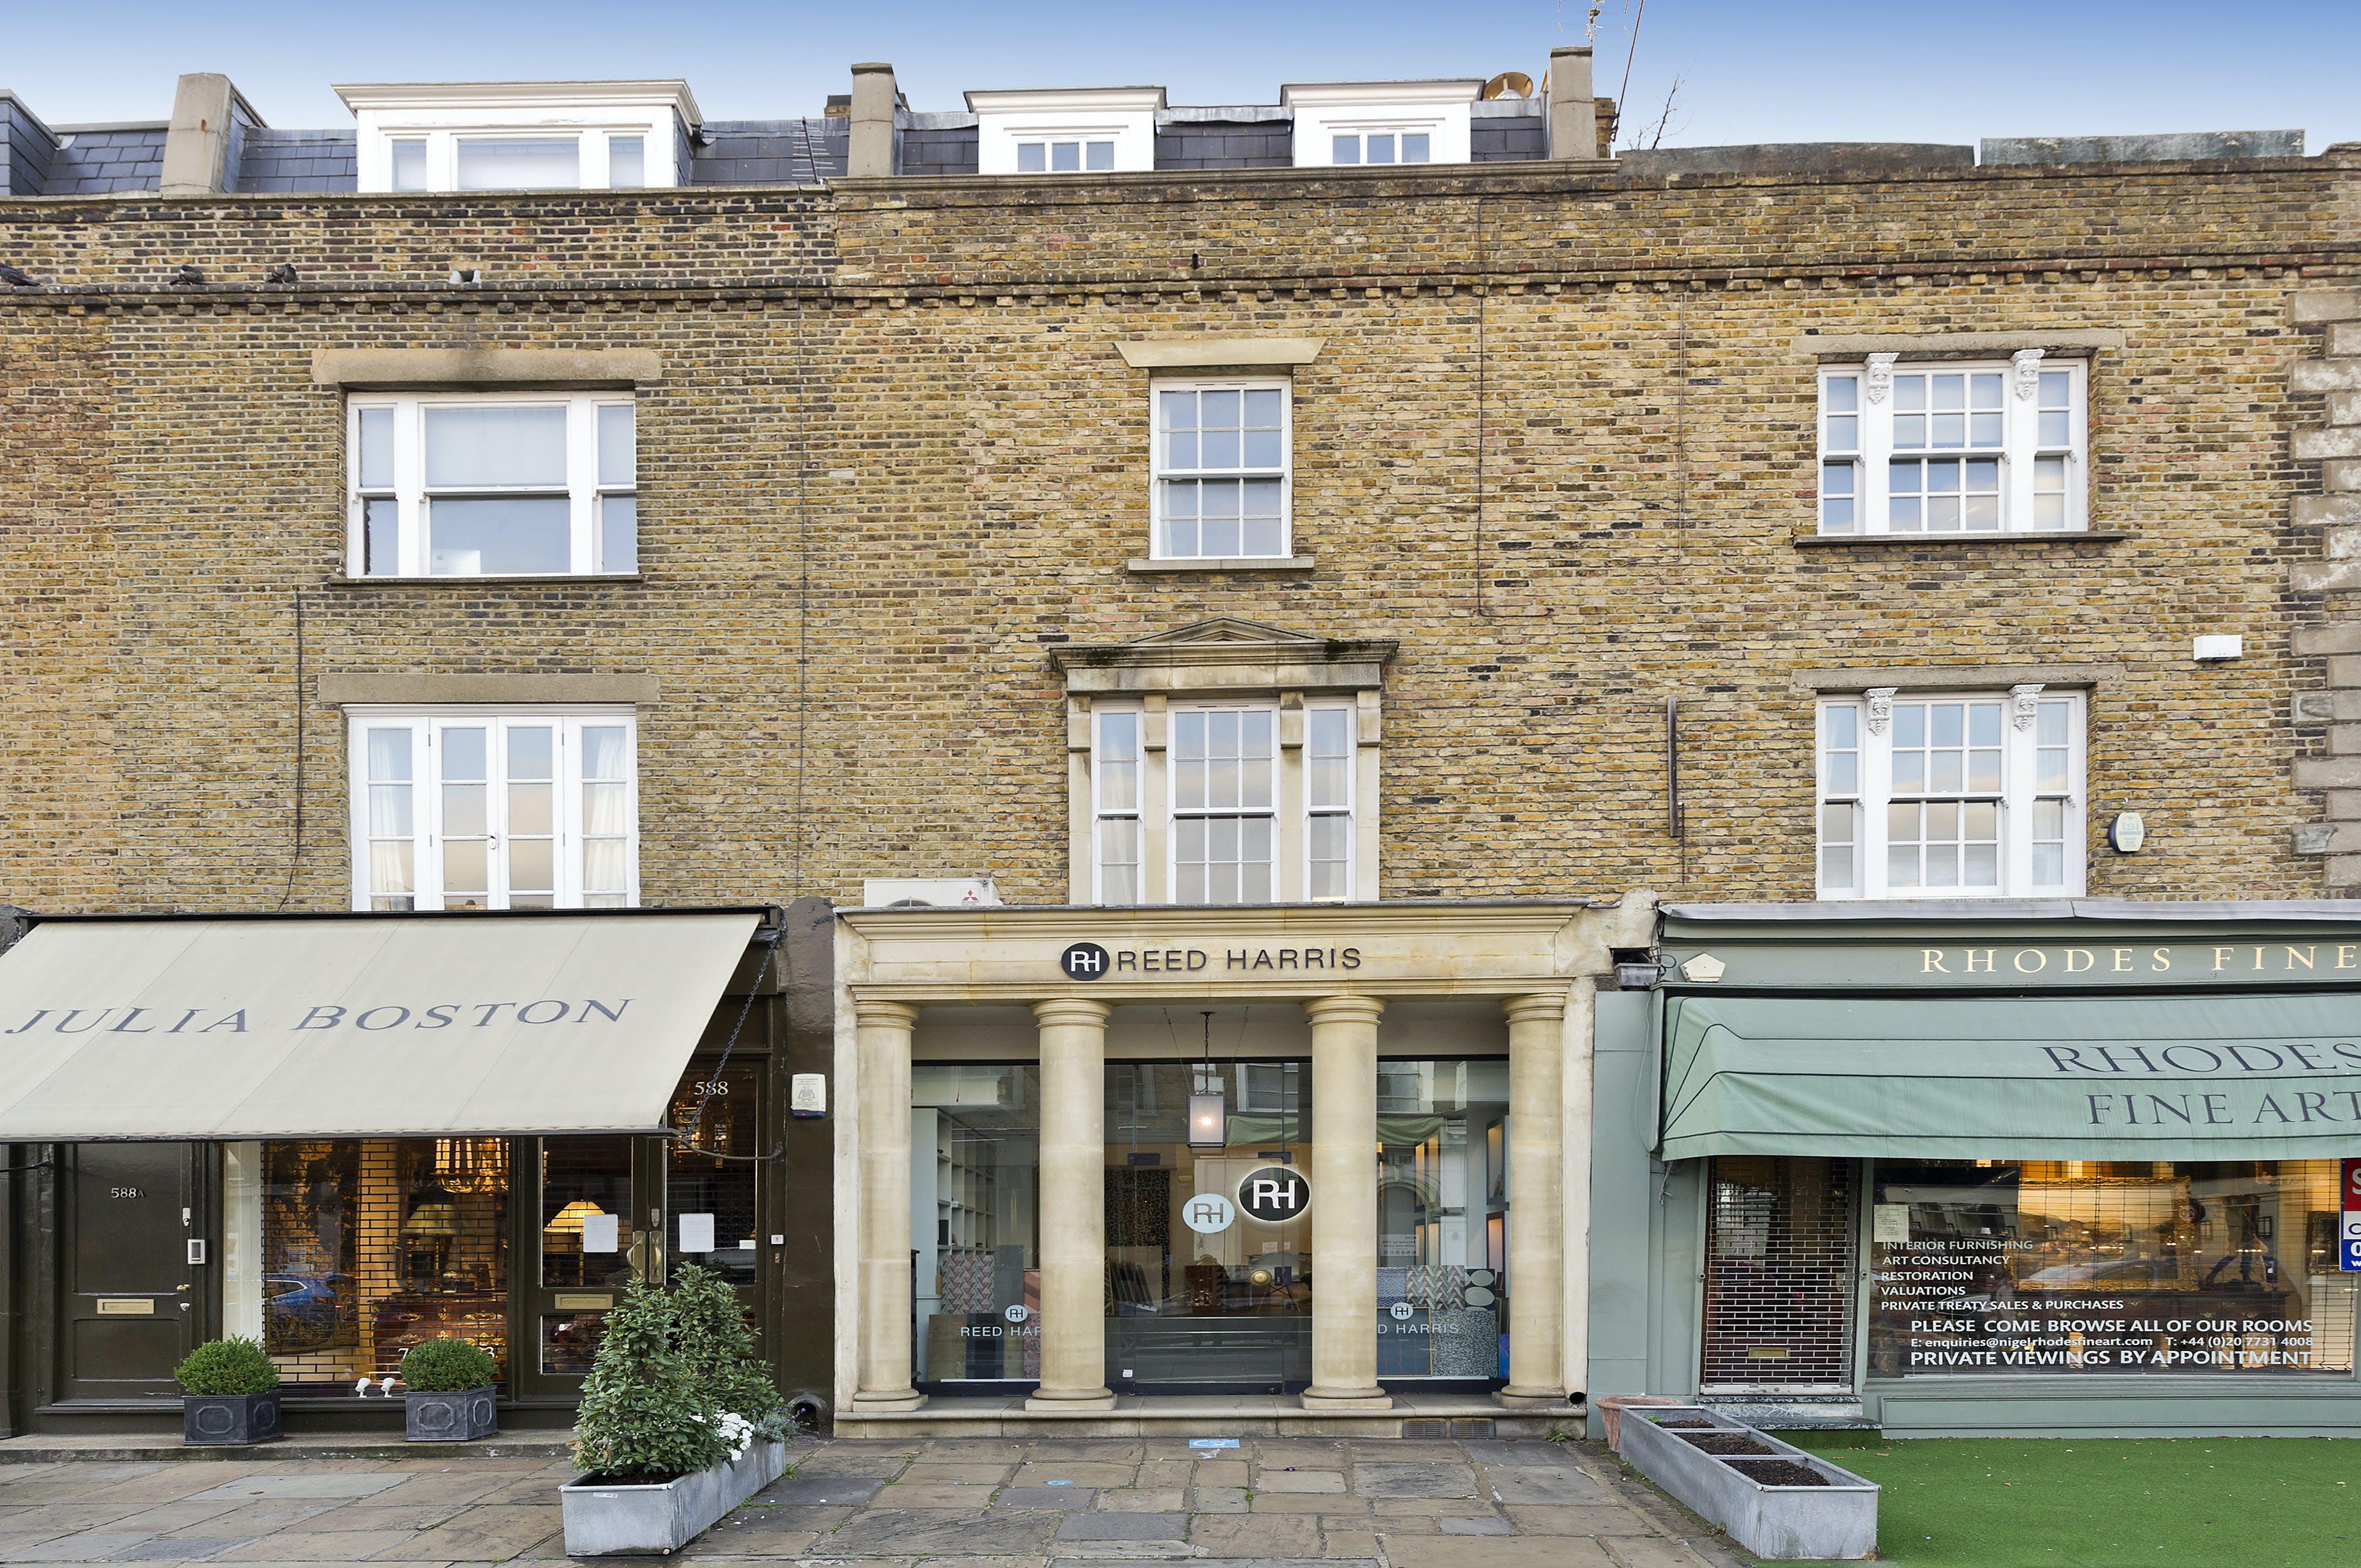 586 Kings Road, London, Office / Residential / Retail For Sale - 586 kings rd0449.jpg